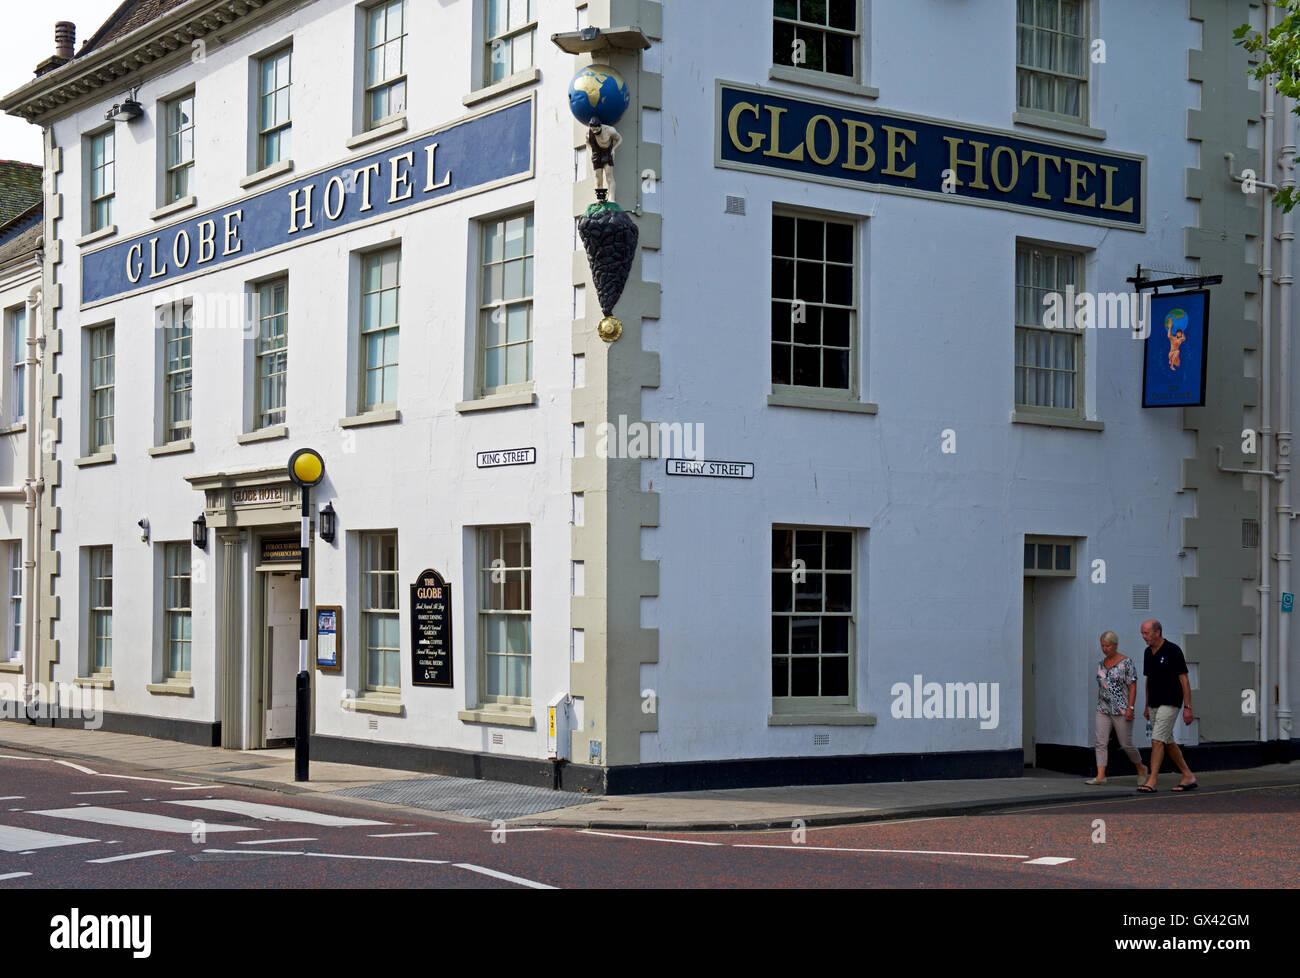 The Wetherspoons Globe Hotel, Kings Lynn, Norfolk, England UK - Stock Image